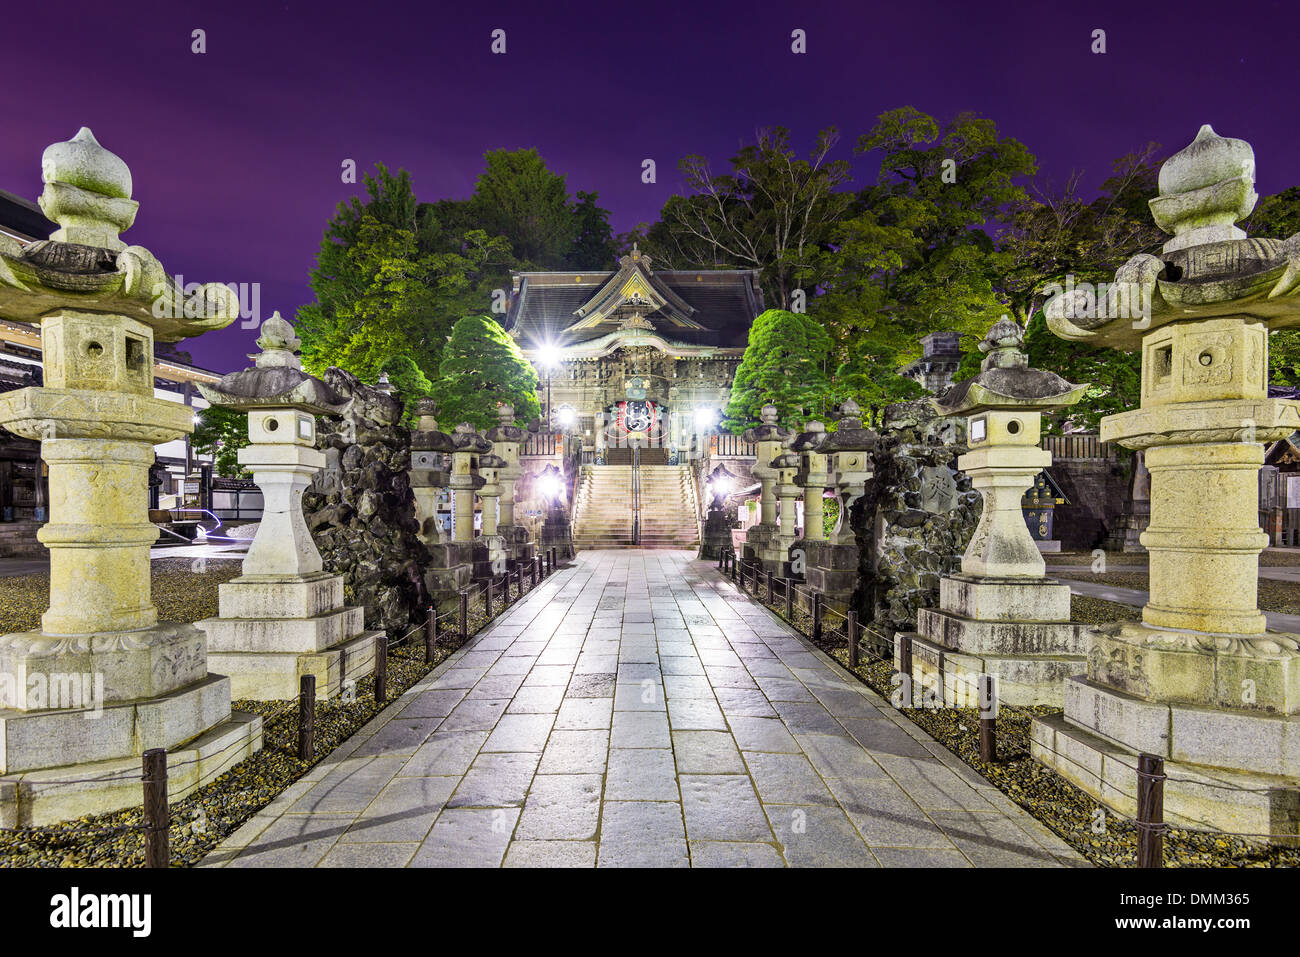 Sanctuaire de Narita de Narita, au Japon. Photo Stock